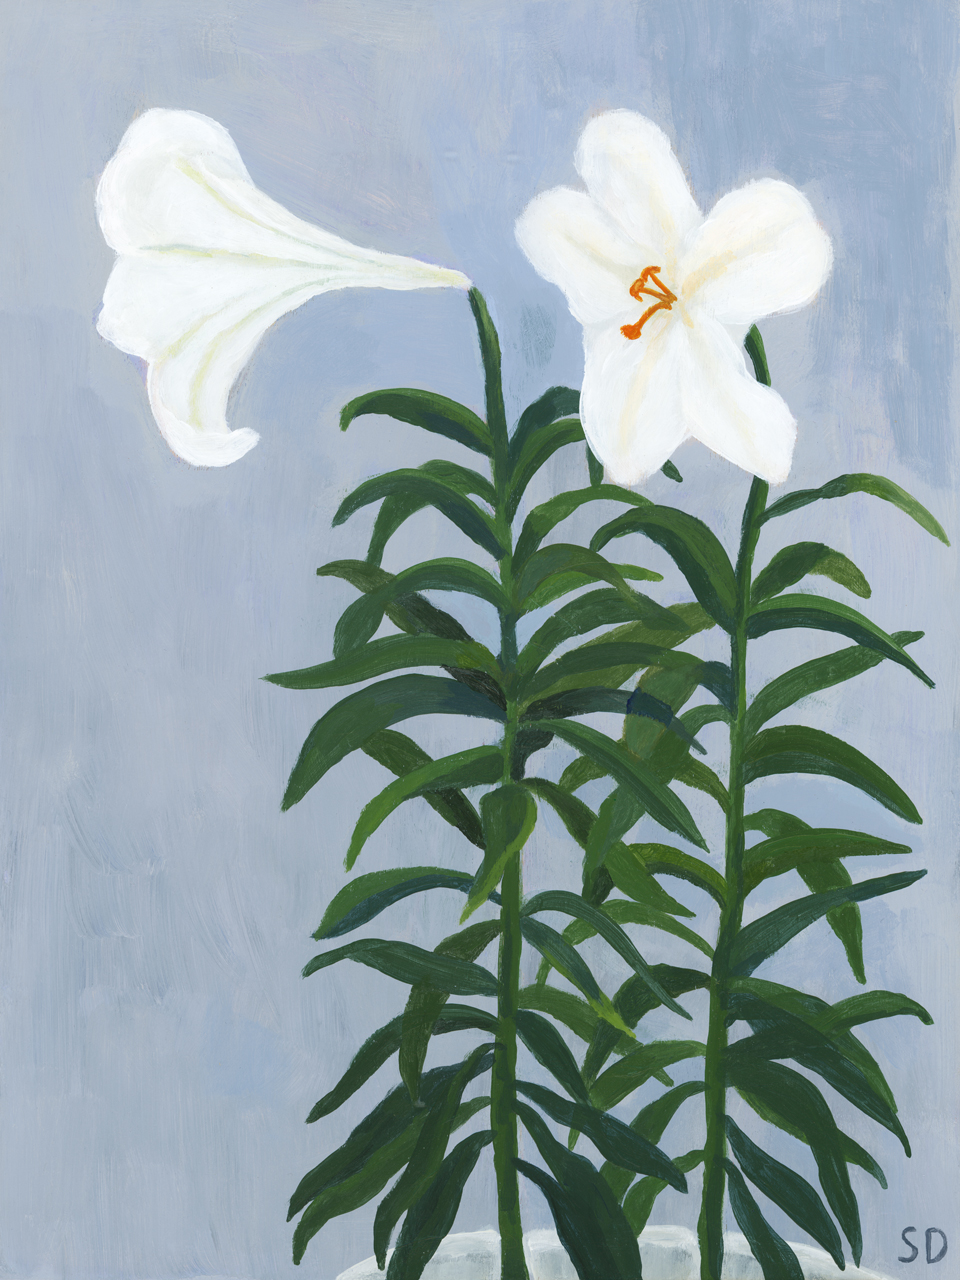 lillies-sophiequi.jpg